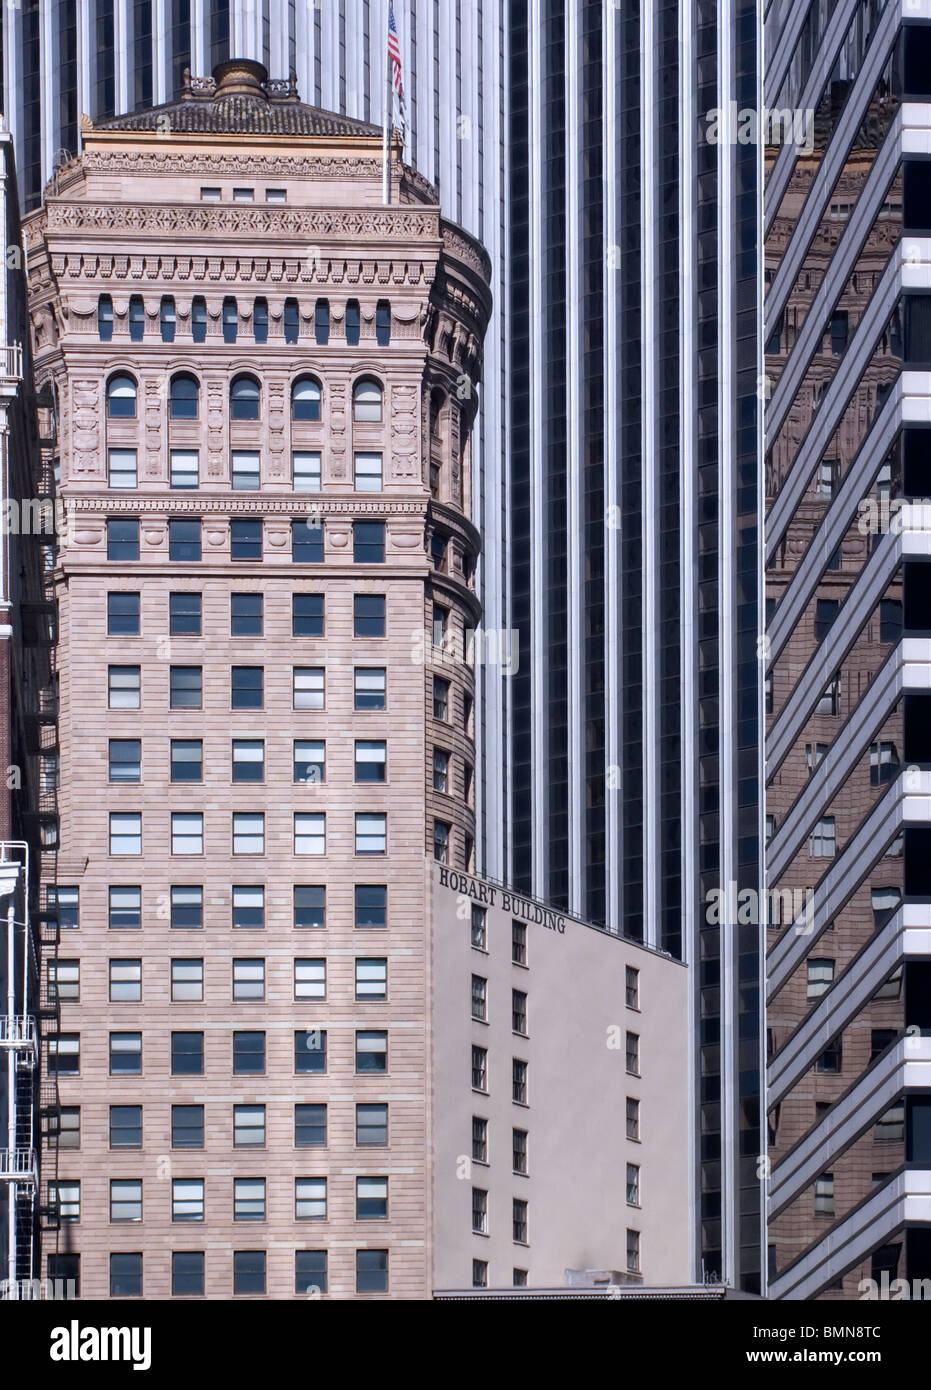 The Hobart Building, San Francisco, California, USA - Stock Image